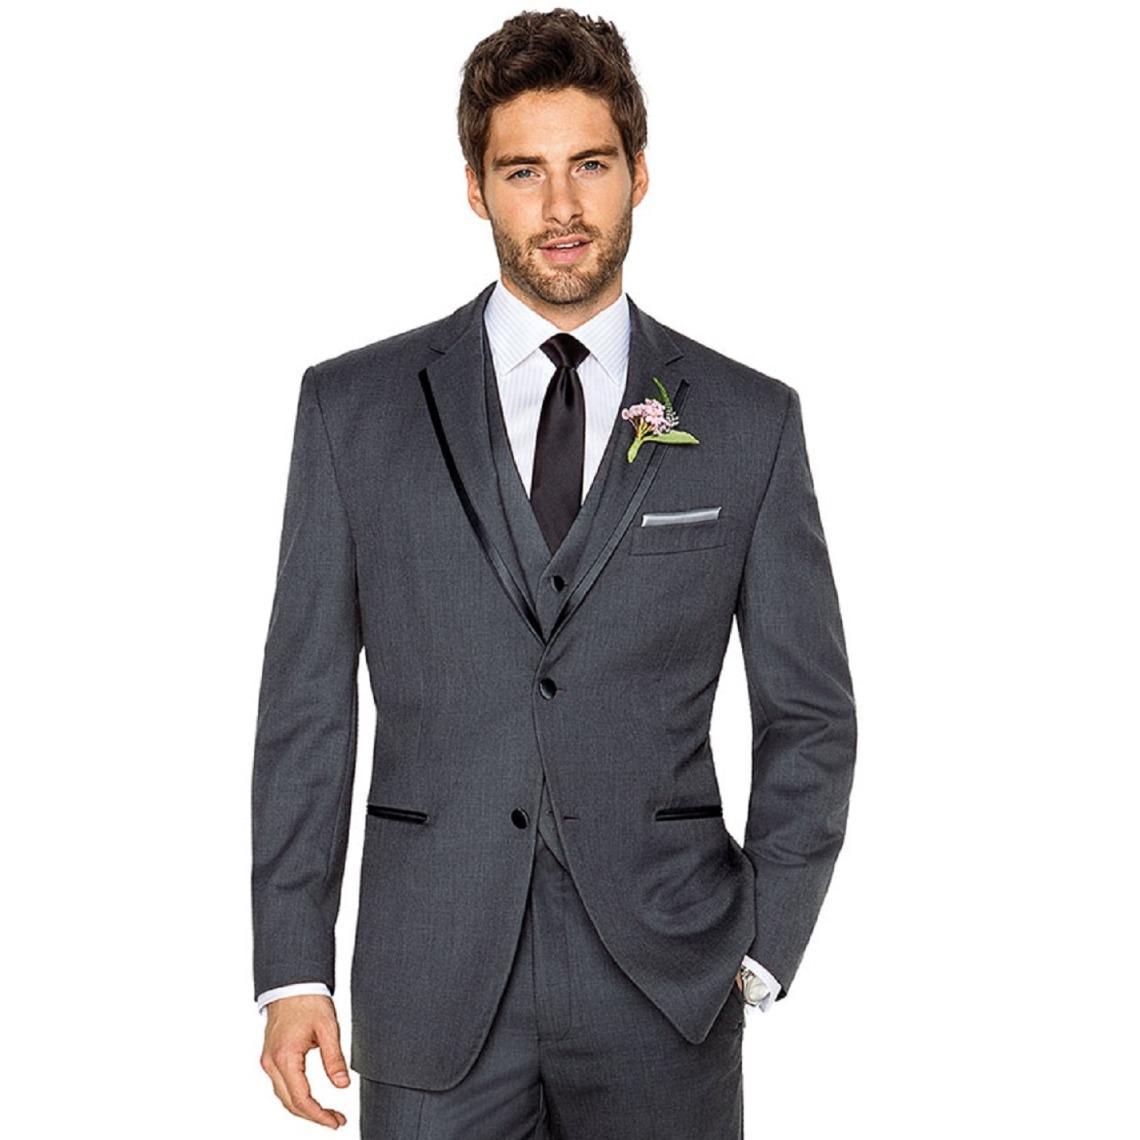 Folkstore - Setelan Jas Wedding Luxury - Jas Prewedding - Jas Pesta (Jas+Vest+Celana) - Slate Blue